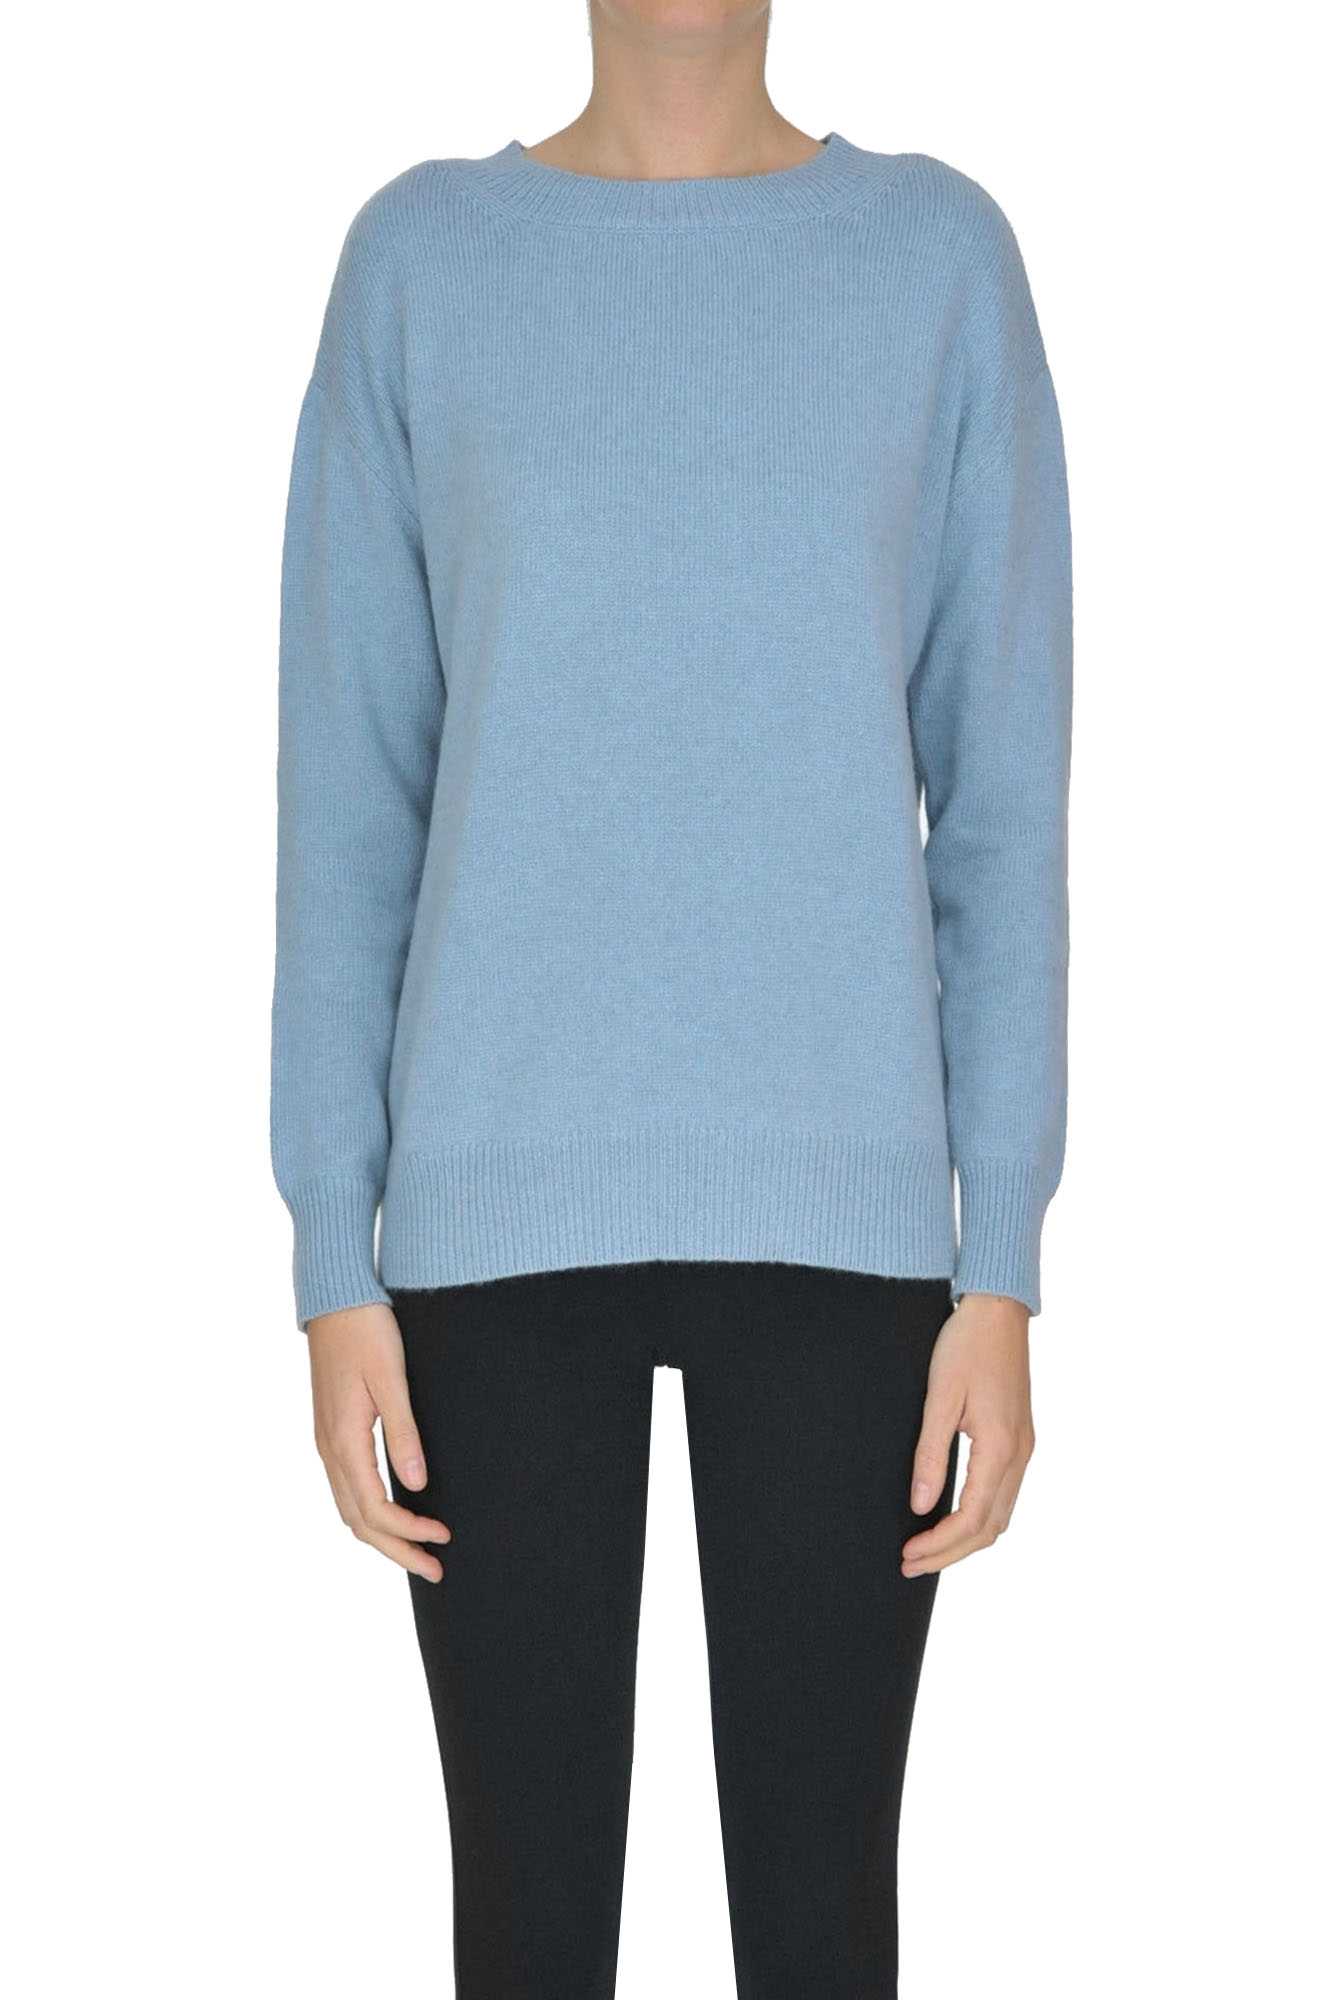 ALYKI Rounded Neckline Cashmere Pullover in Light Blue